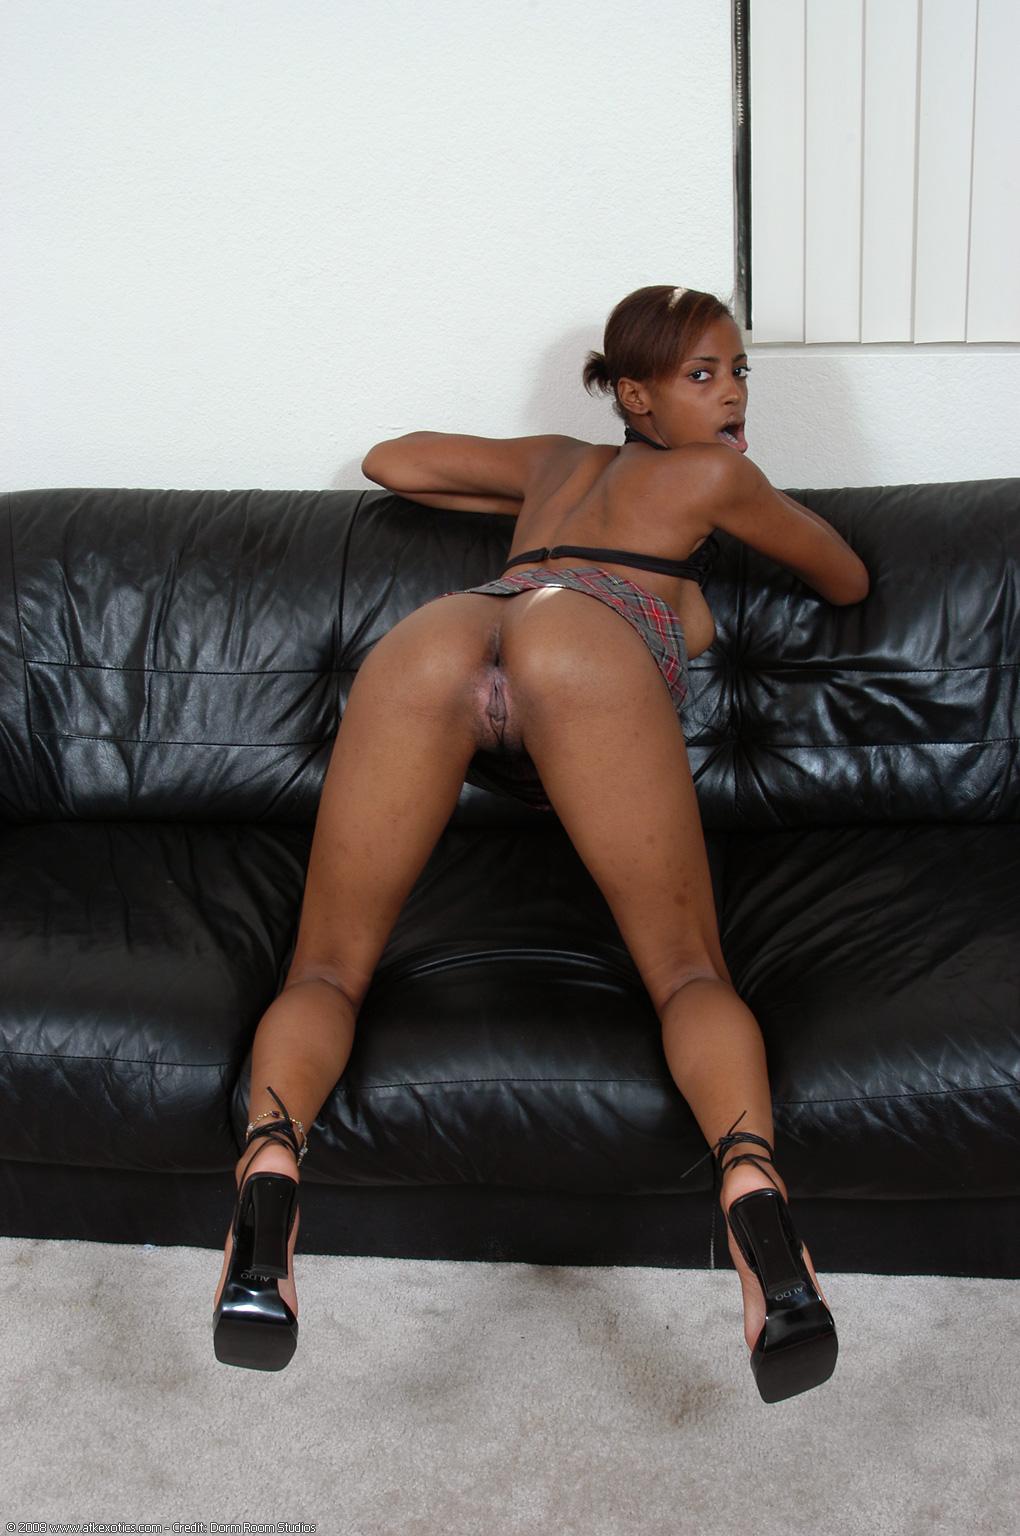 College girl sexy chocolate booty fucked hard 10